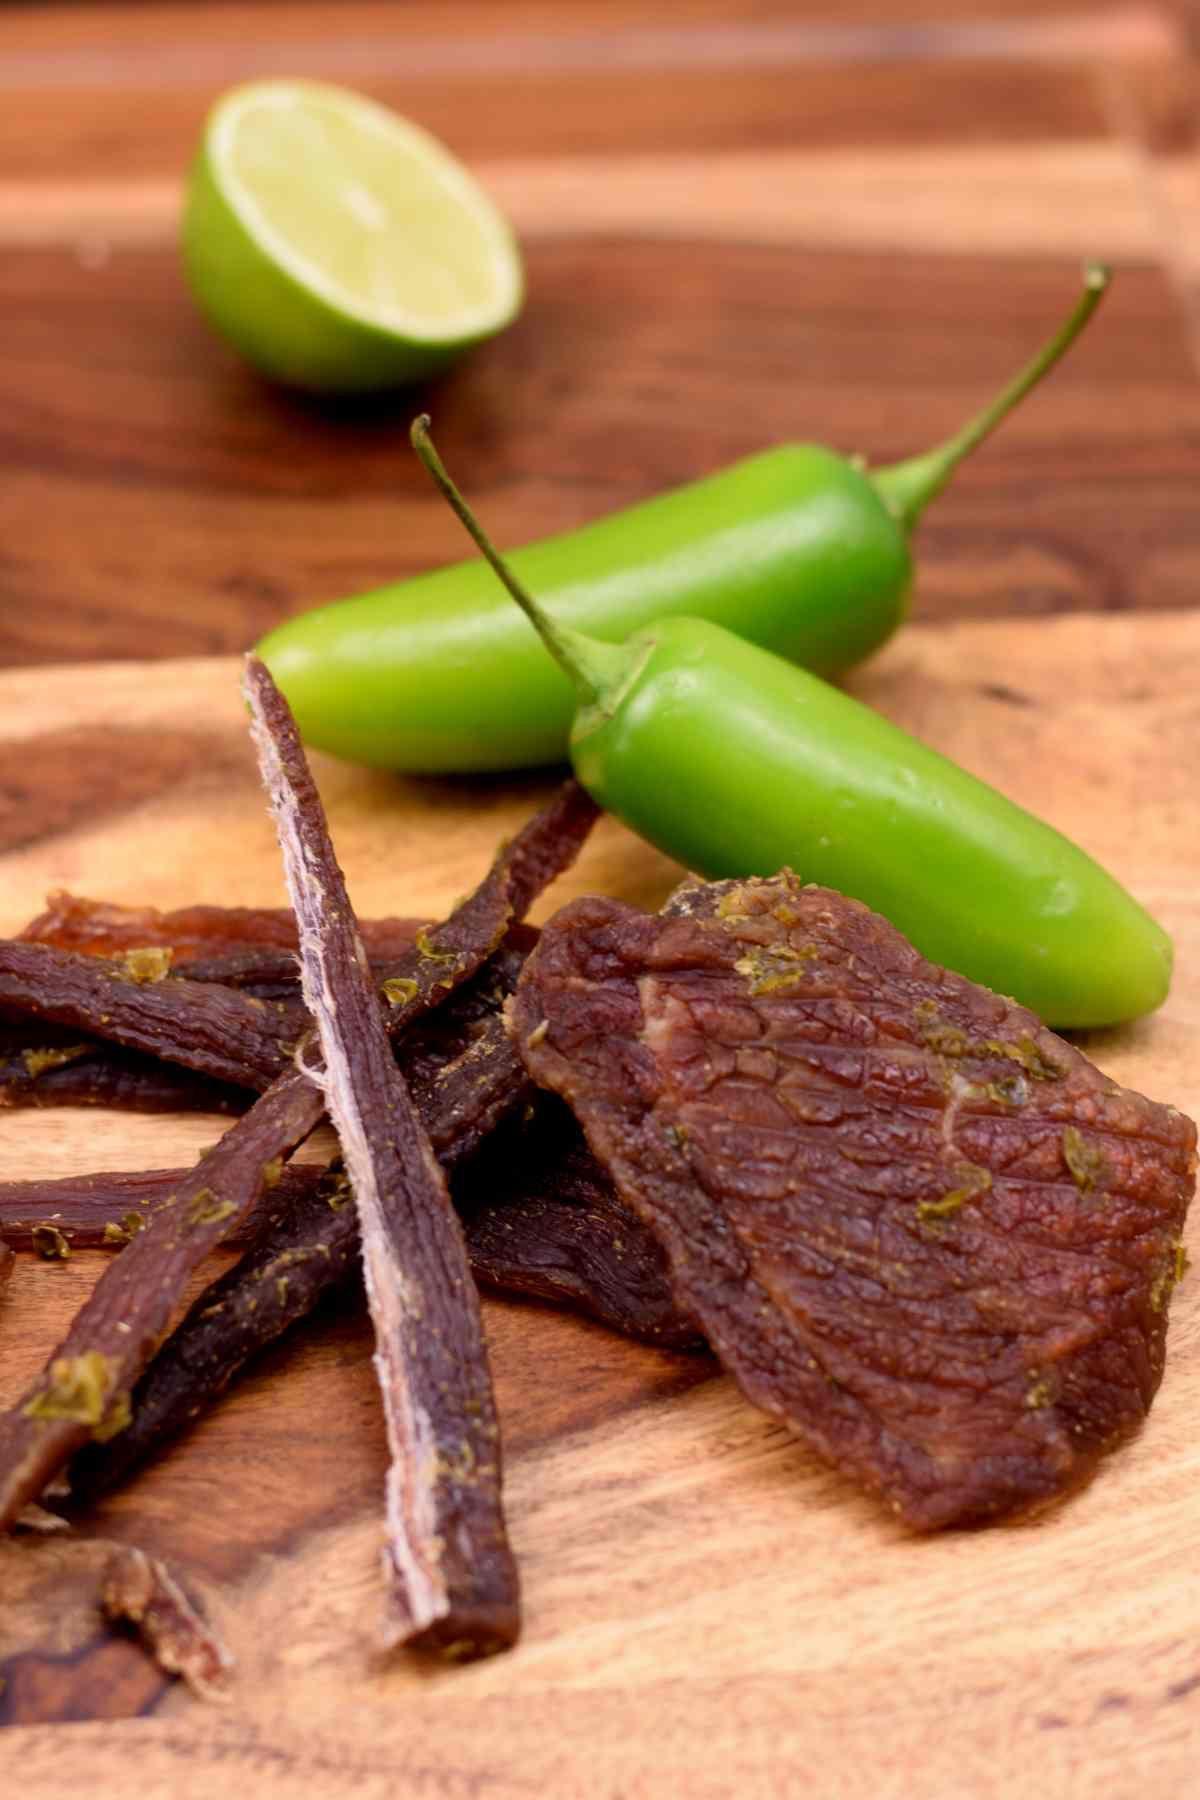 Jalapeno Lime Beef Jerky Recipe Beef Jerky Recipes Jerky Marinade Recipes Simple Beef Jerky Recipe